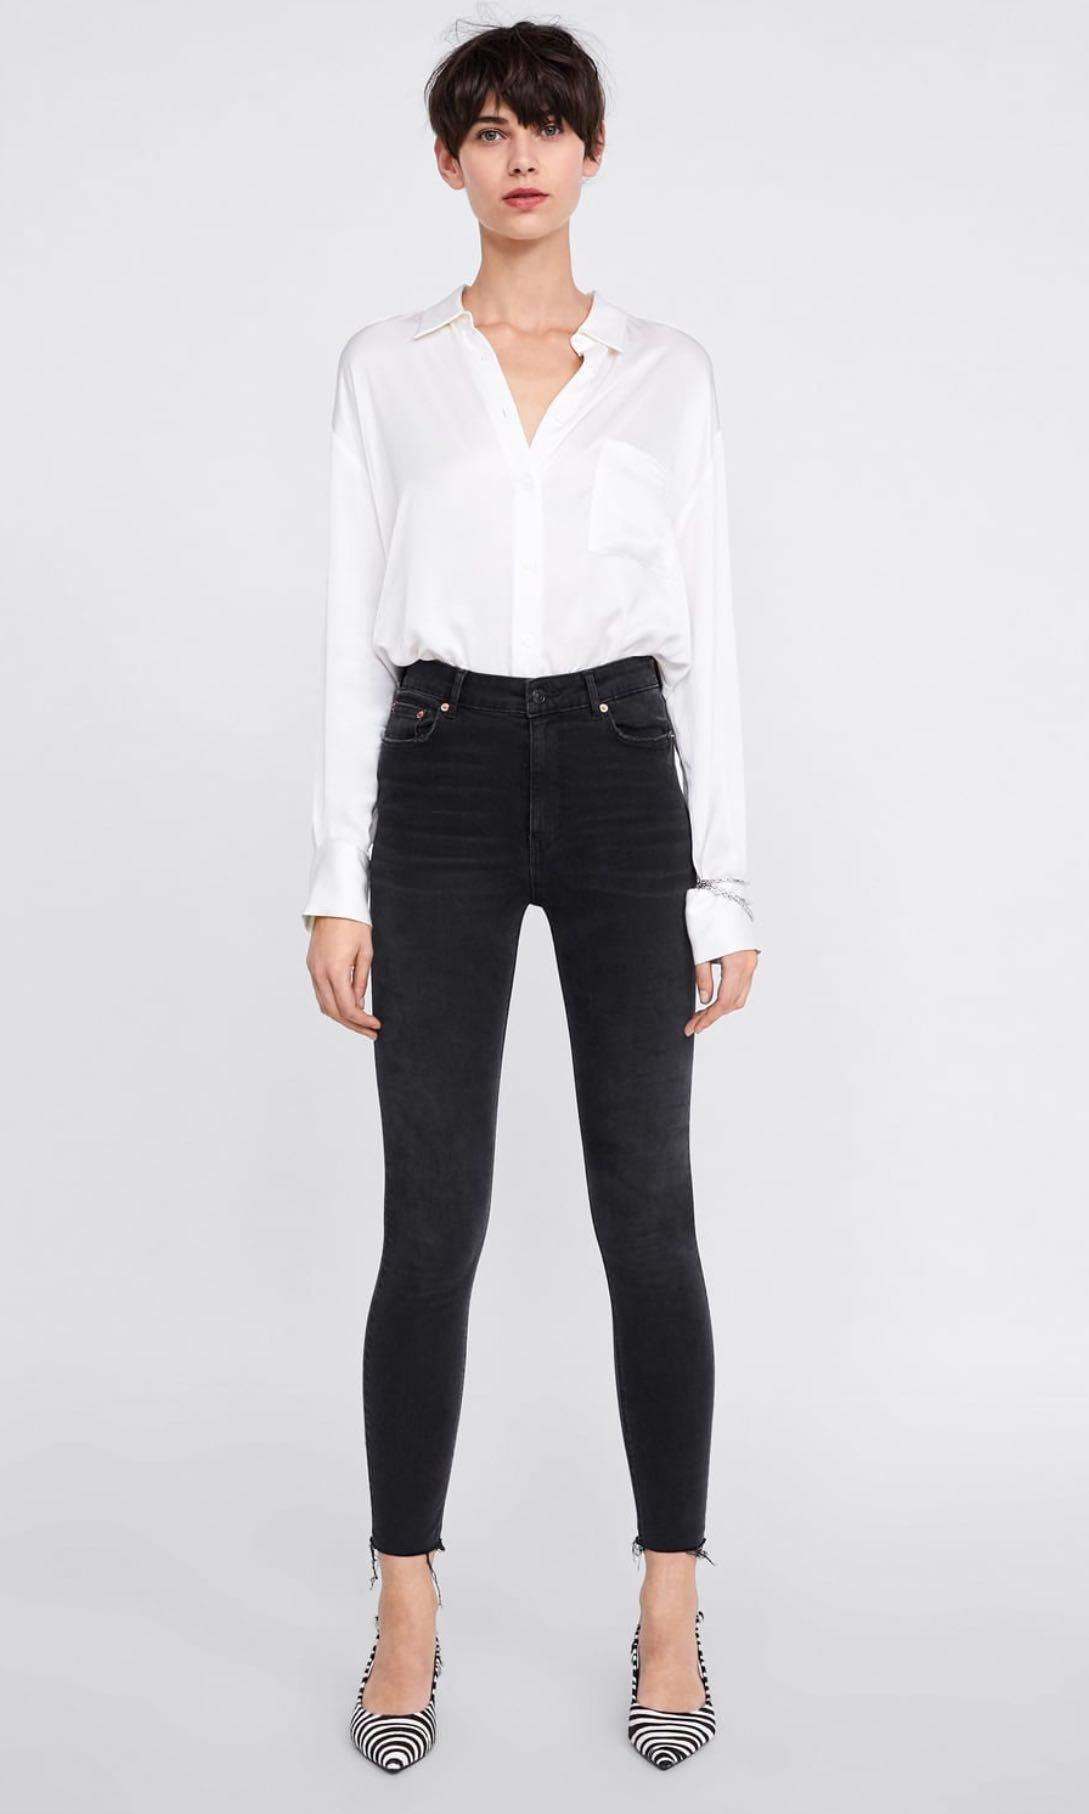 f61b8455 Zara High Waist Denim Jeans Shadow Black, Women's Fashion, Clothes ...